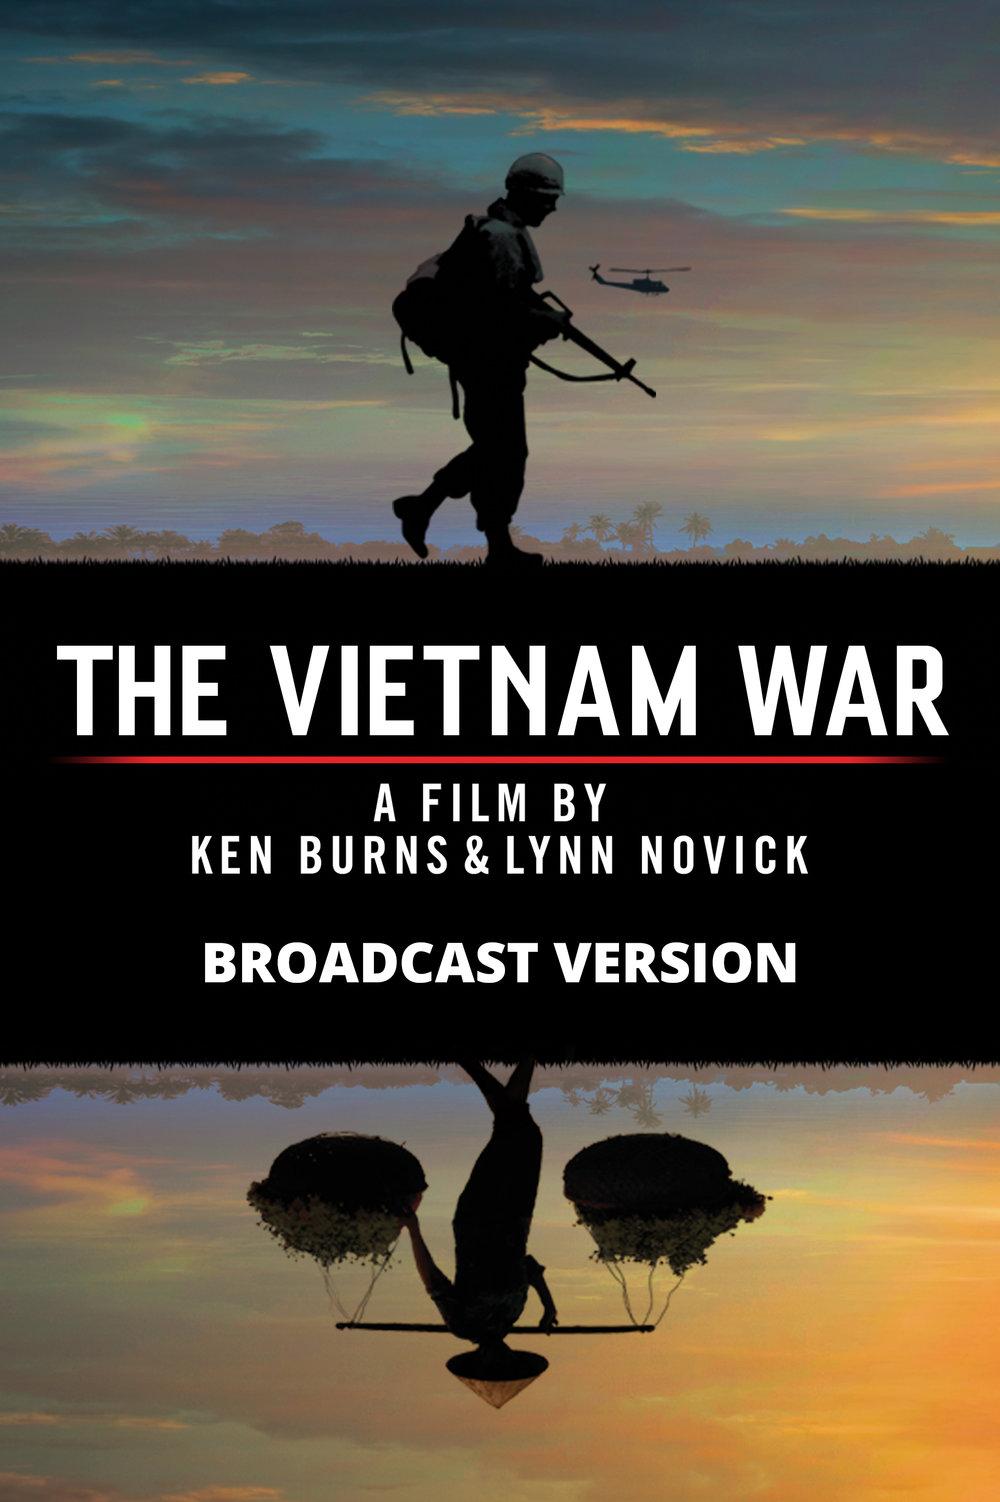 VietnamWarDoc.jpg